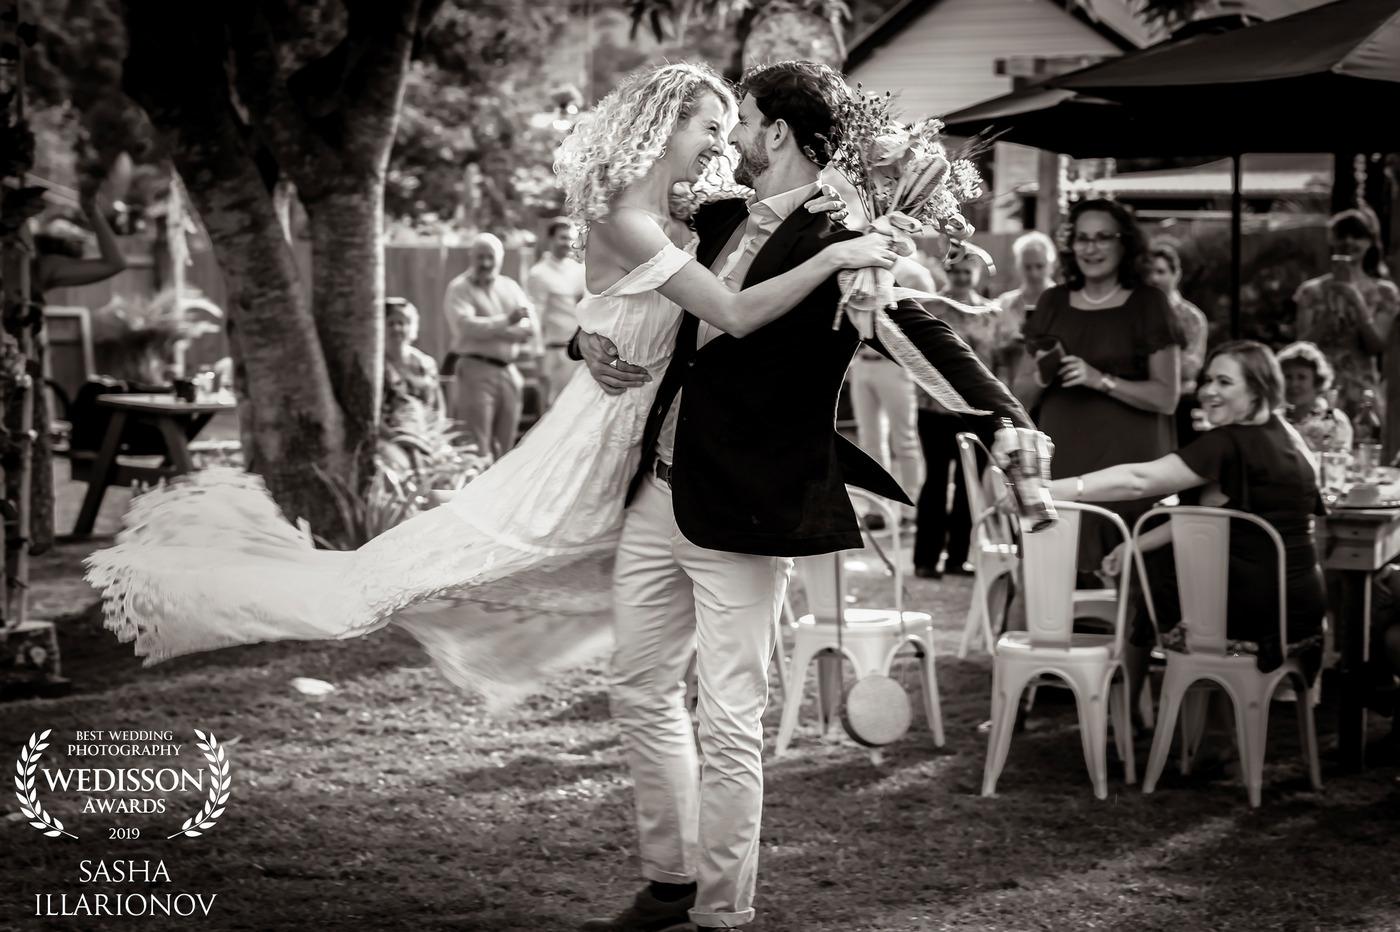 adelaide wedding photography award 08.jpg